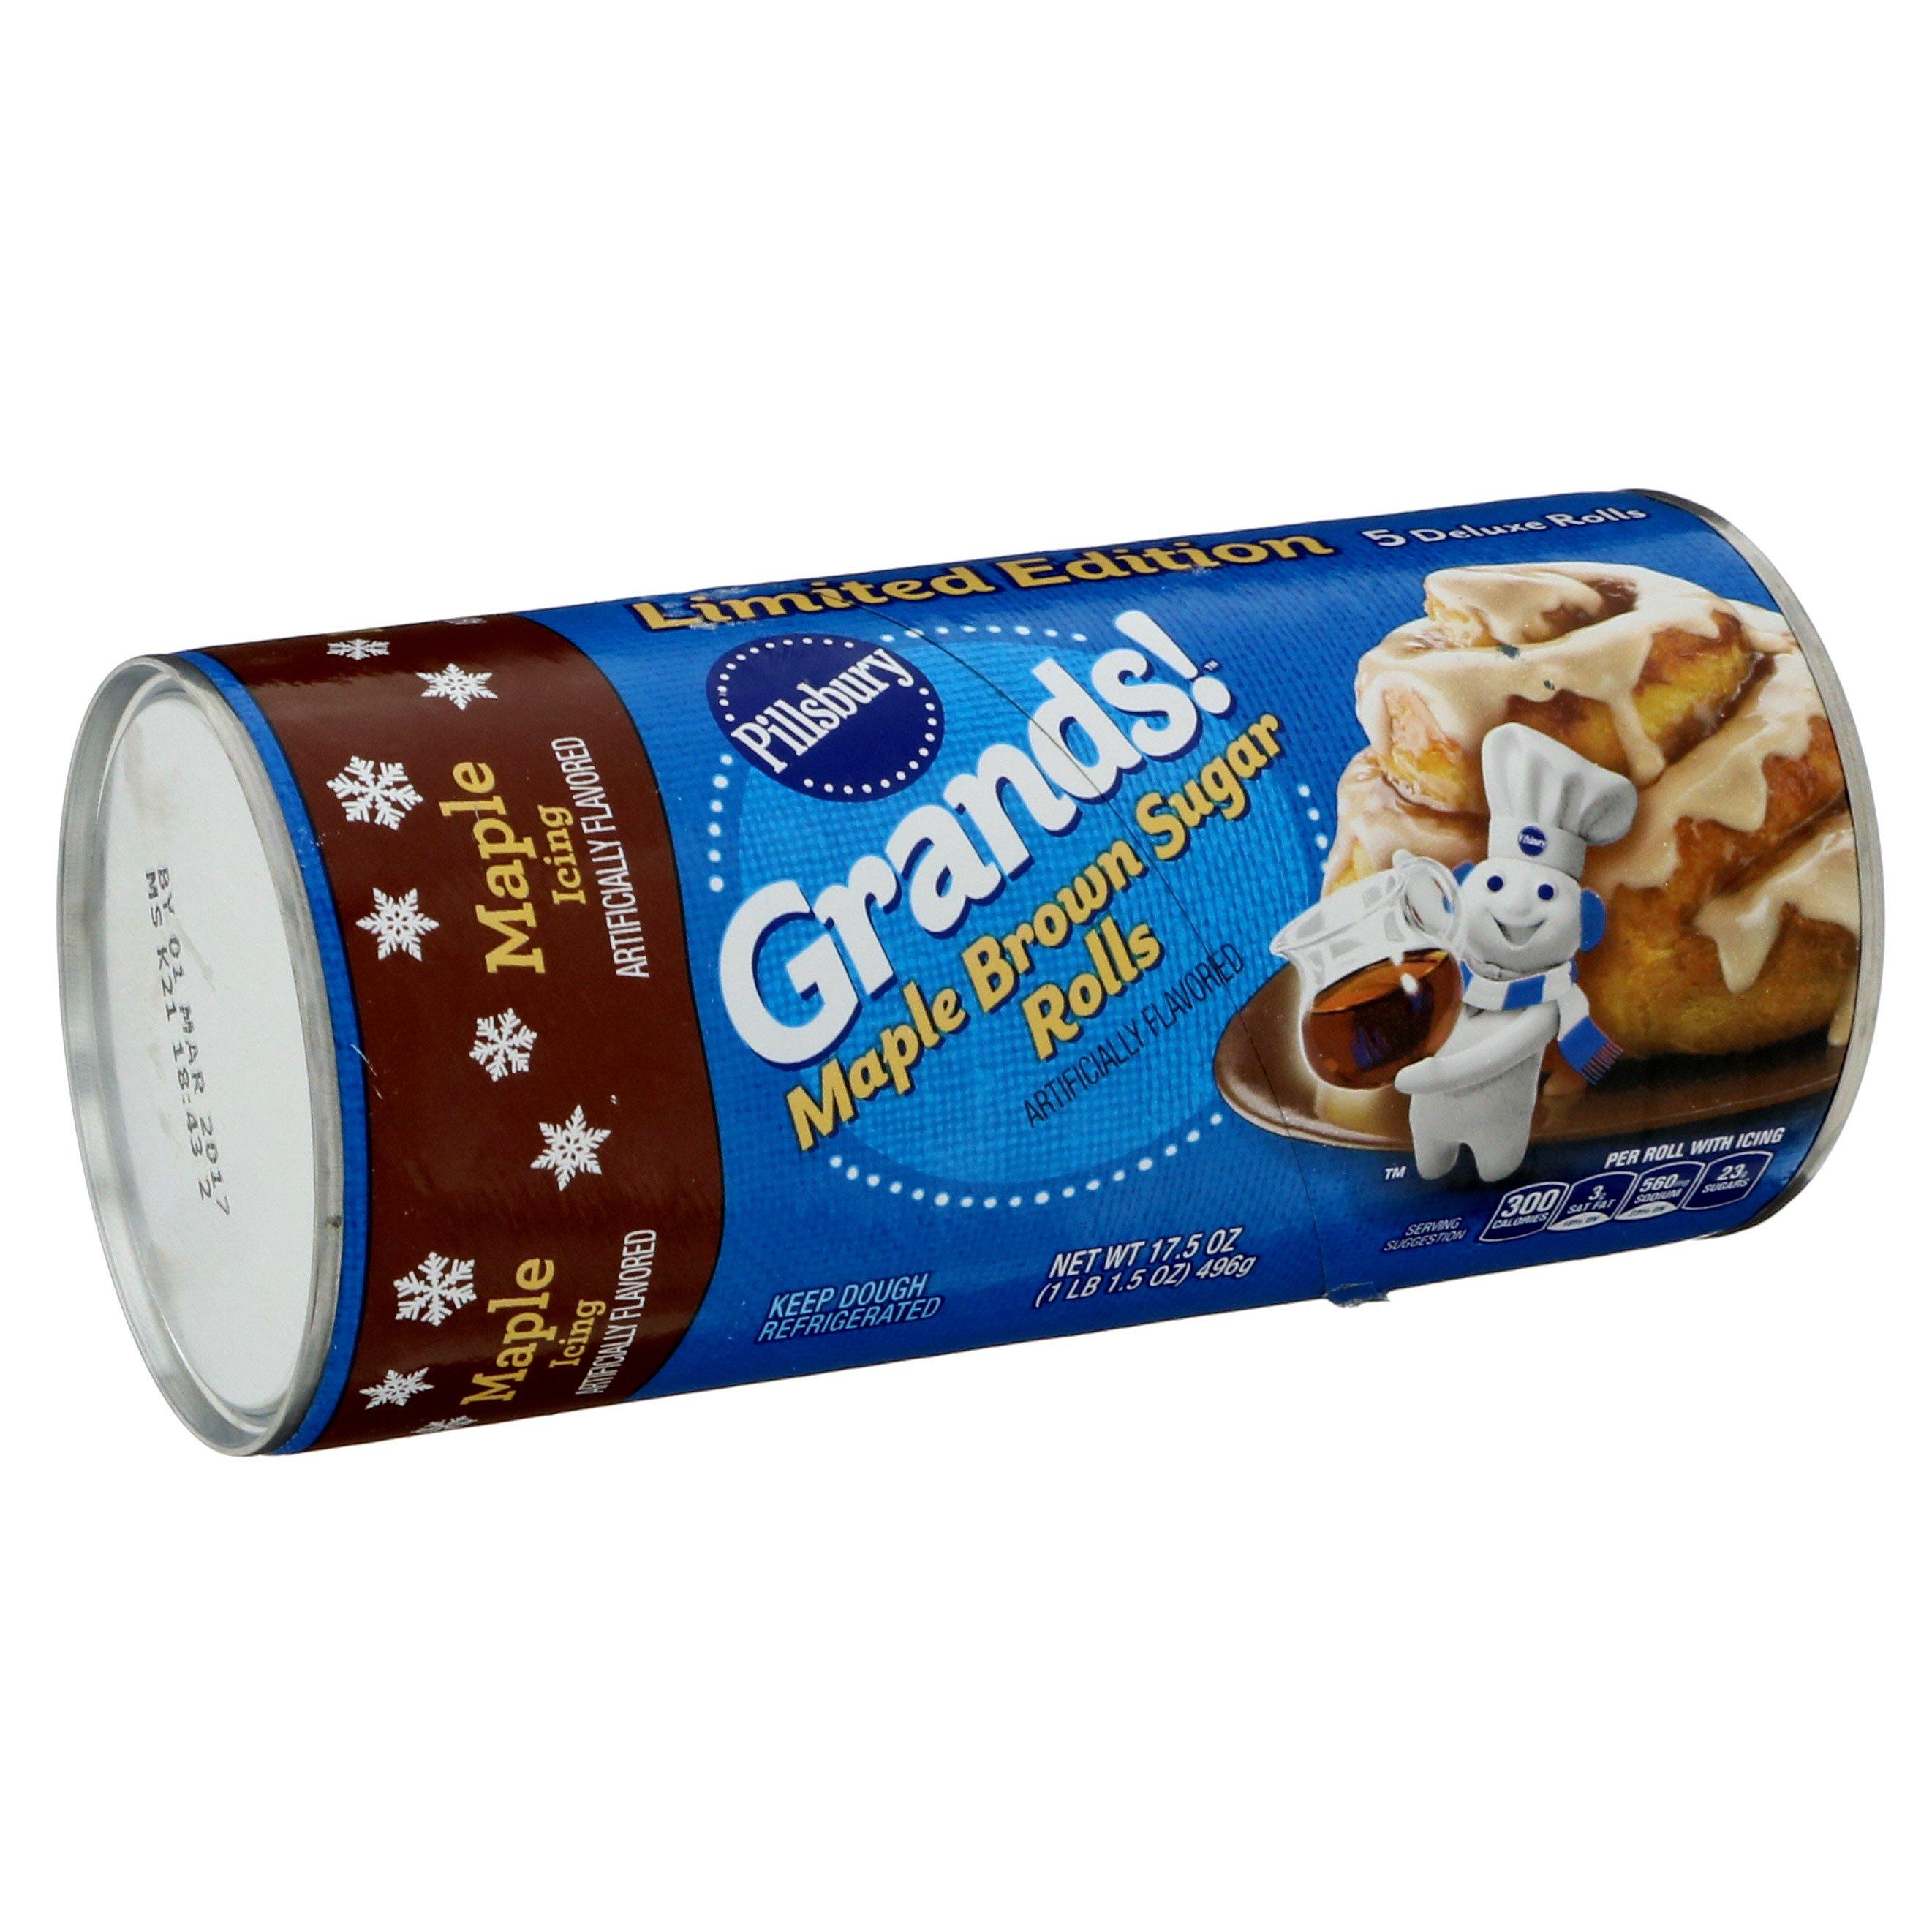 Pillsbury Grands! Maple Brown Sugar Rolls - Shop Biscuit & Cookie Dough at H-E-B